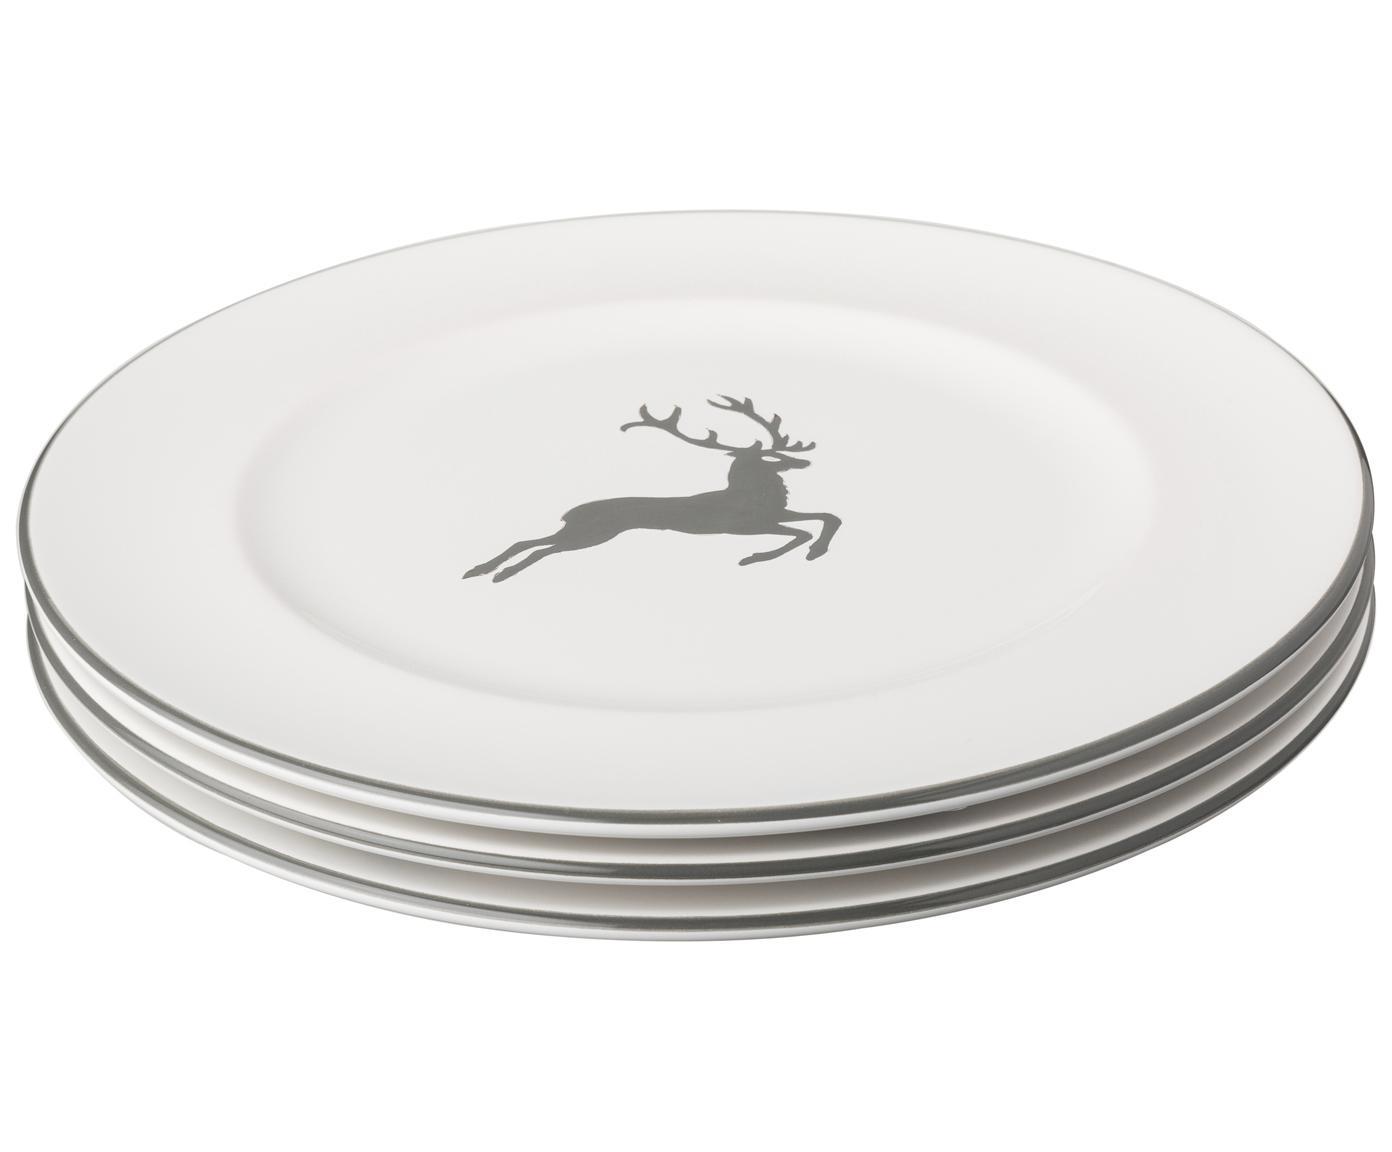 Plato llano Gourmet Grauer Hirsch, Cerámica, Gris, blanco, Ø 27 cm